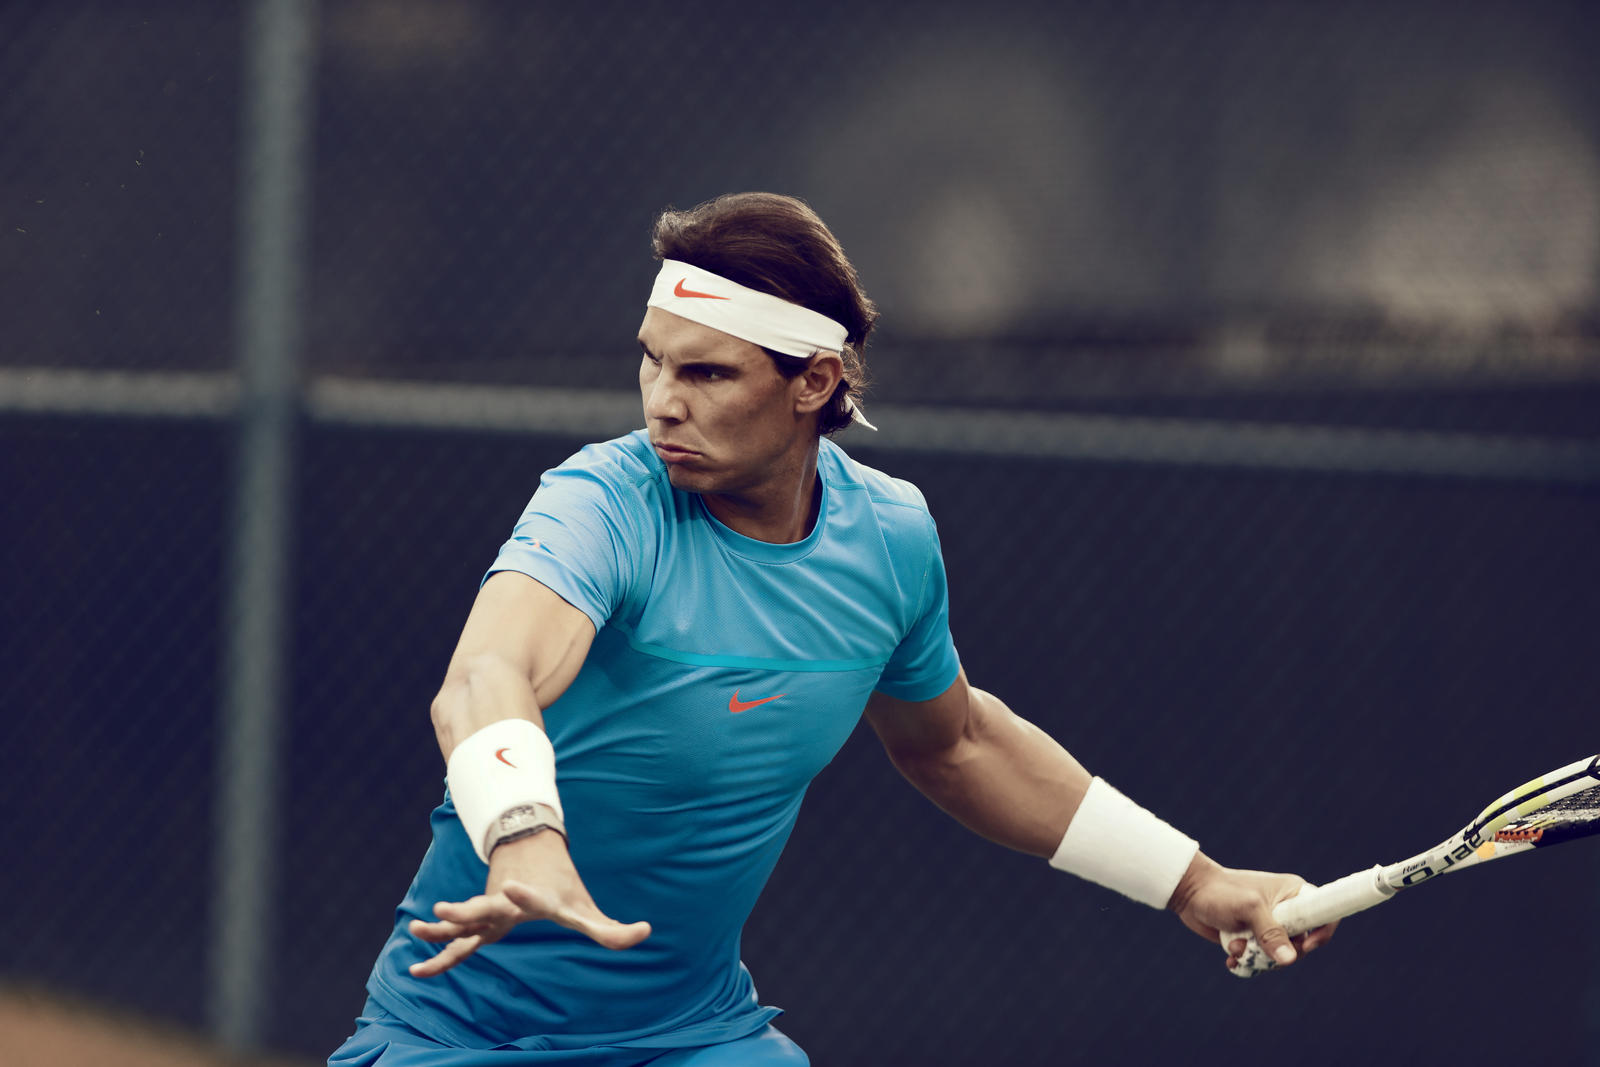 Robusto himno Nacional Mascotas  Rafael Nadal Roland Garros 2015 Nike Outfit – Rafael Nadal Fans